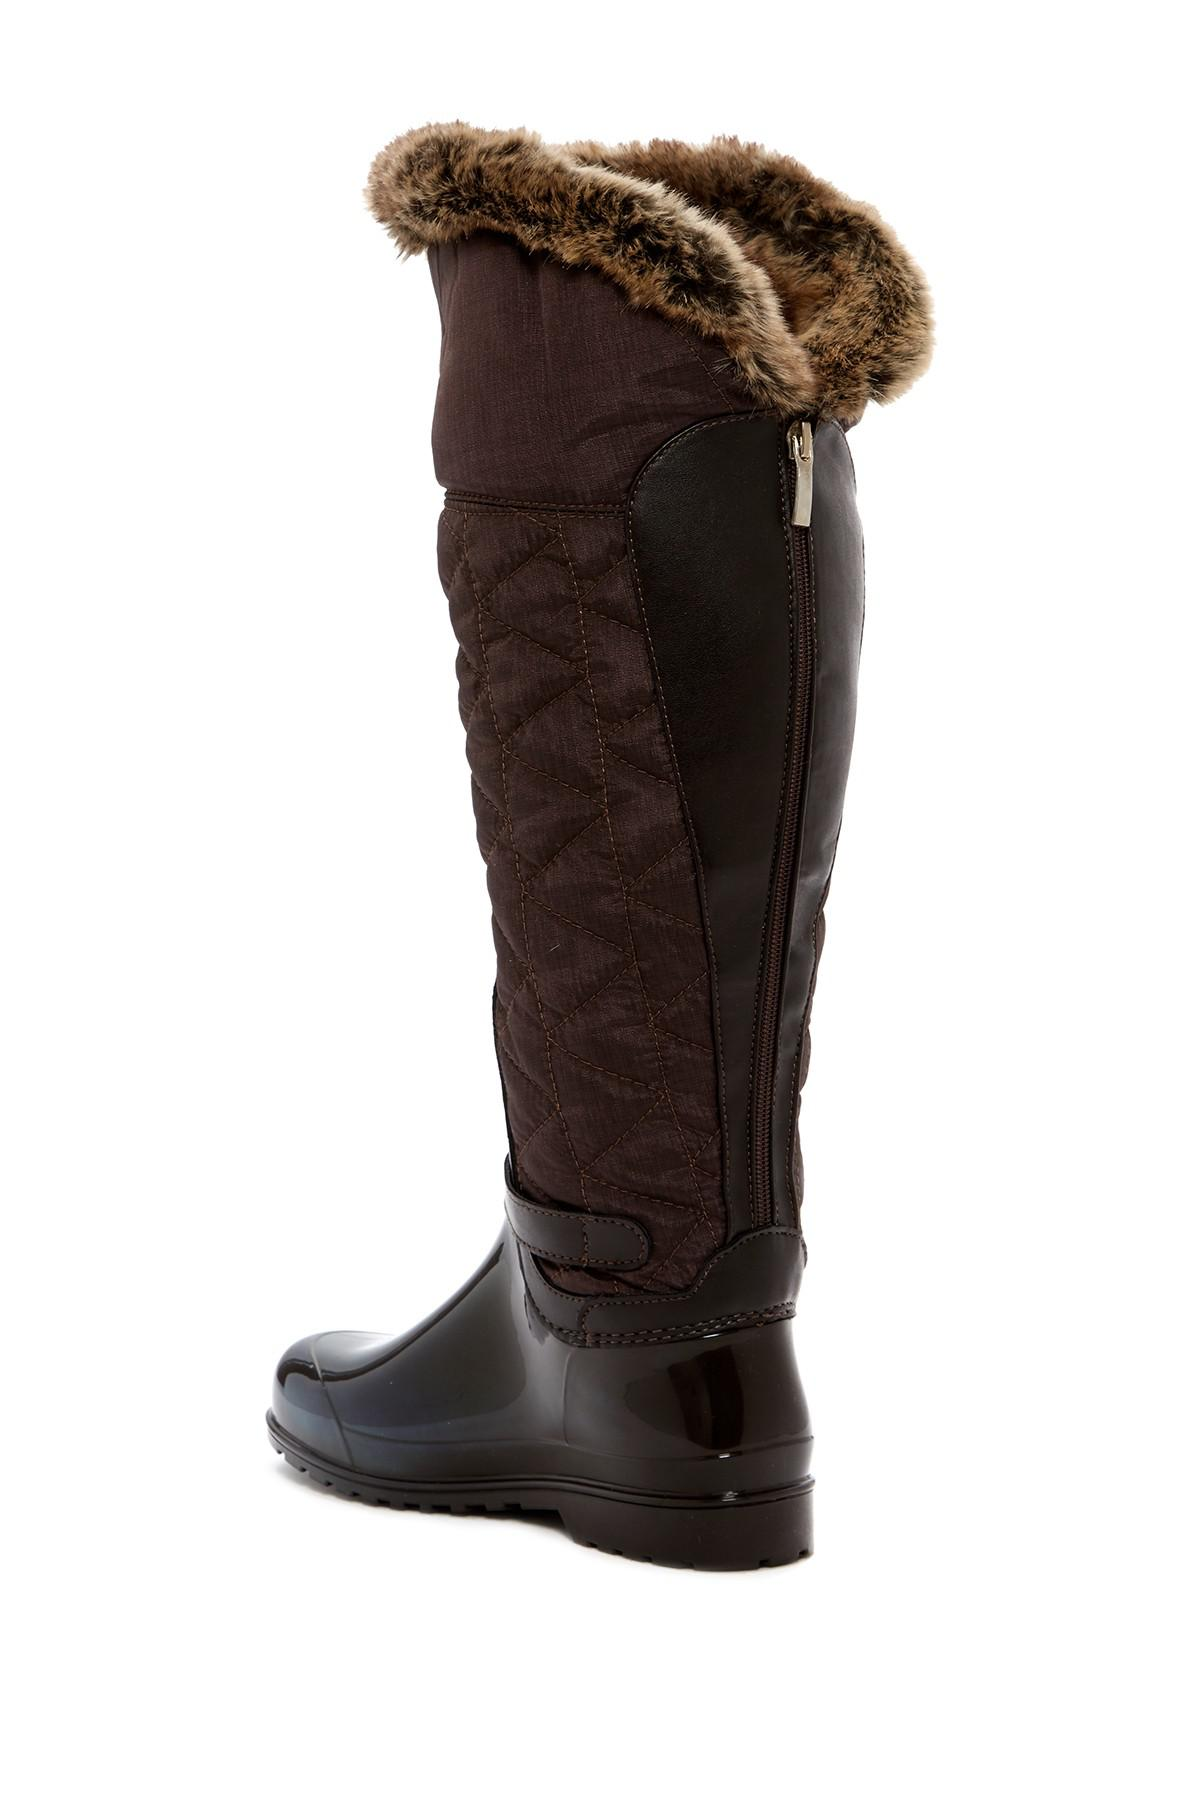 Santana Canada Clarissa 2 Nylon & Faux Fur Trimmed Waterproof Rain Boot w8SIzaDIS